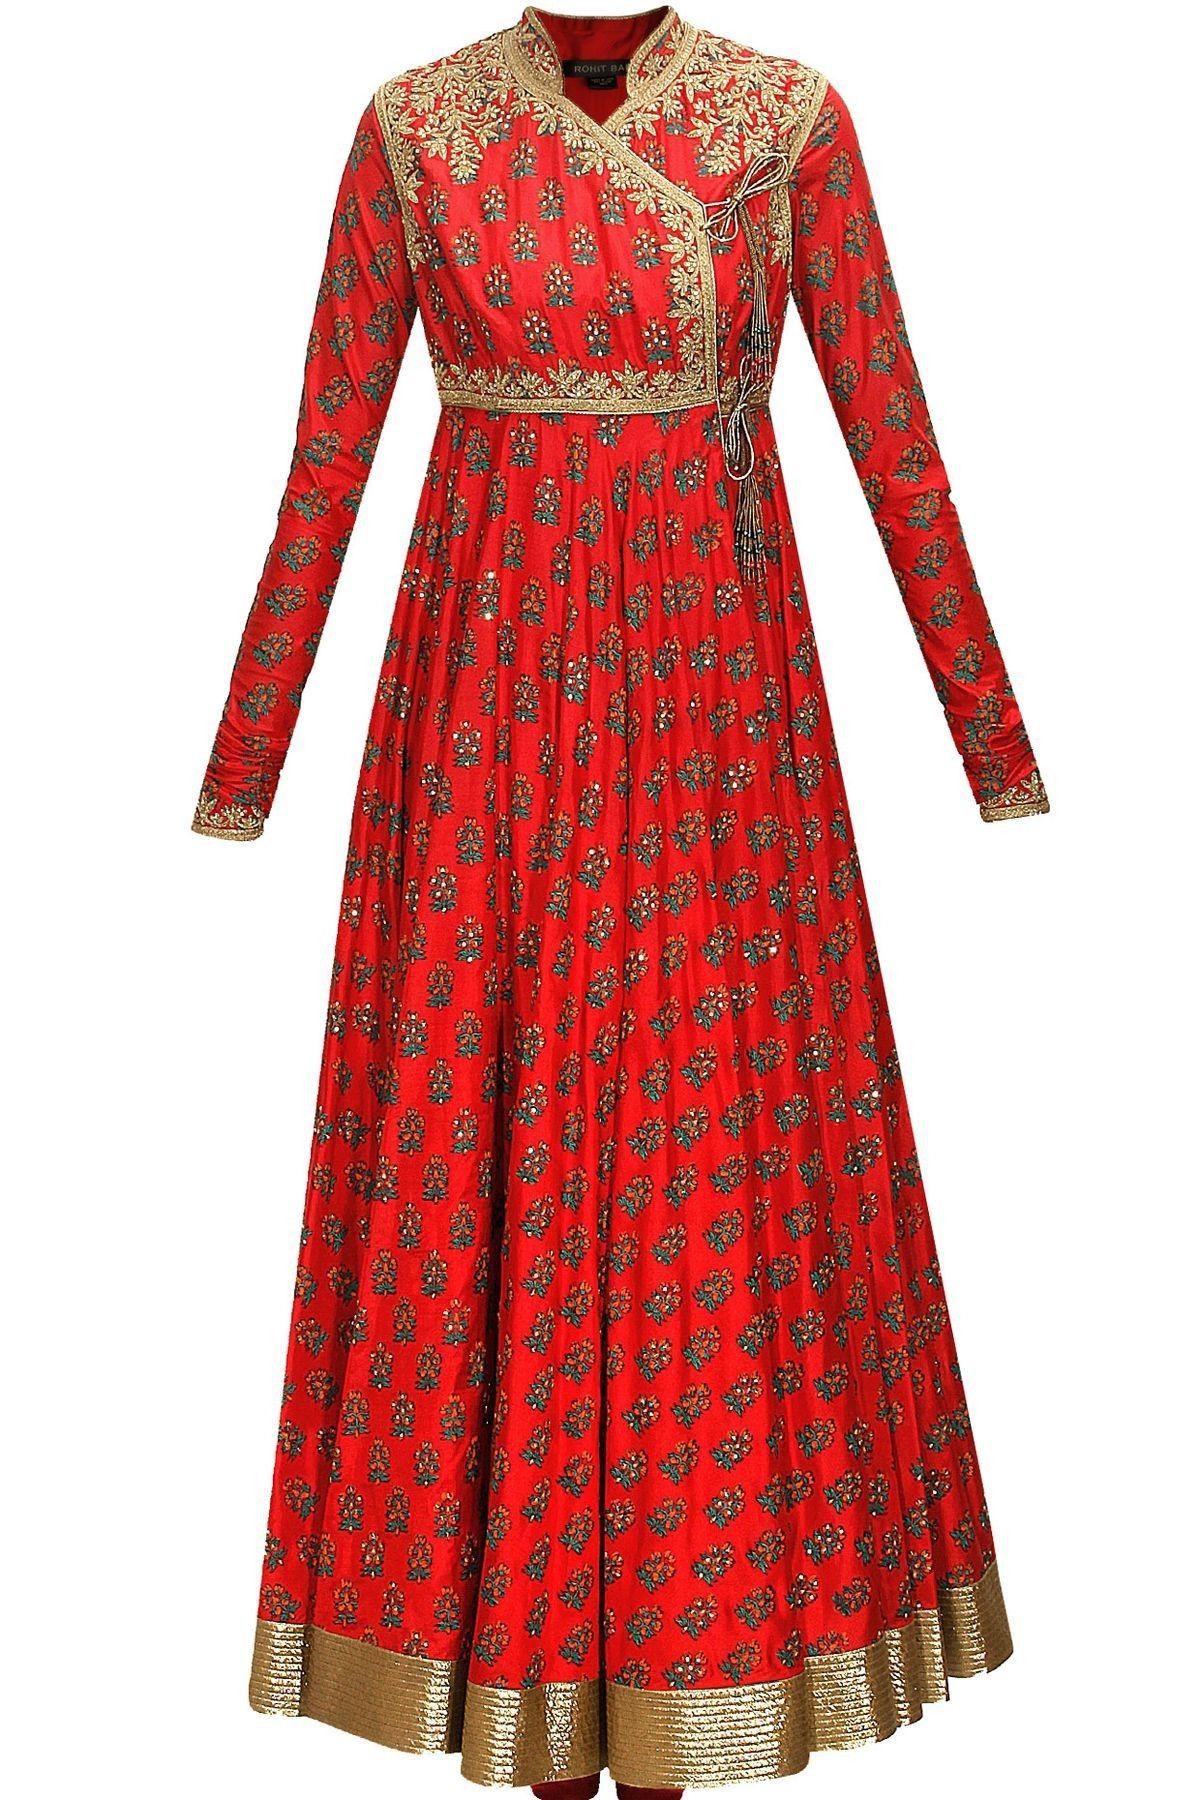 Pin by namrata sojatia on long dress in pinterest dresses